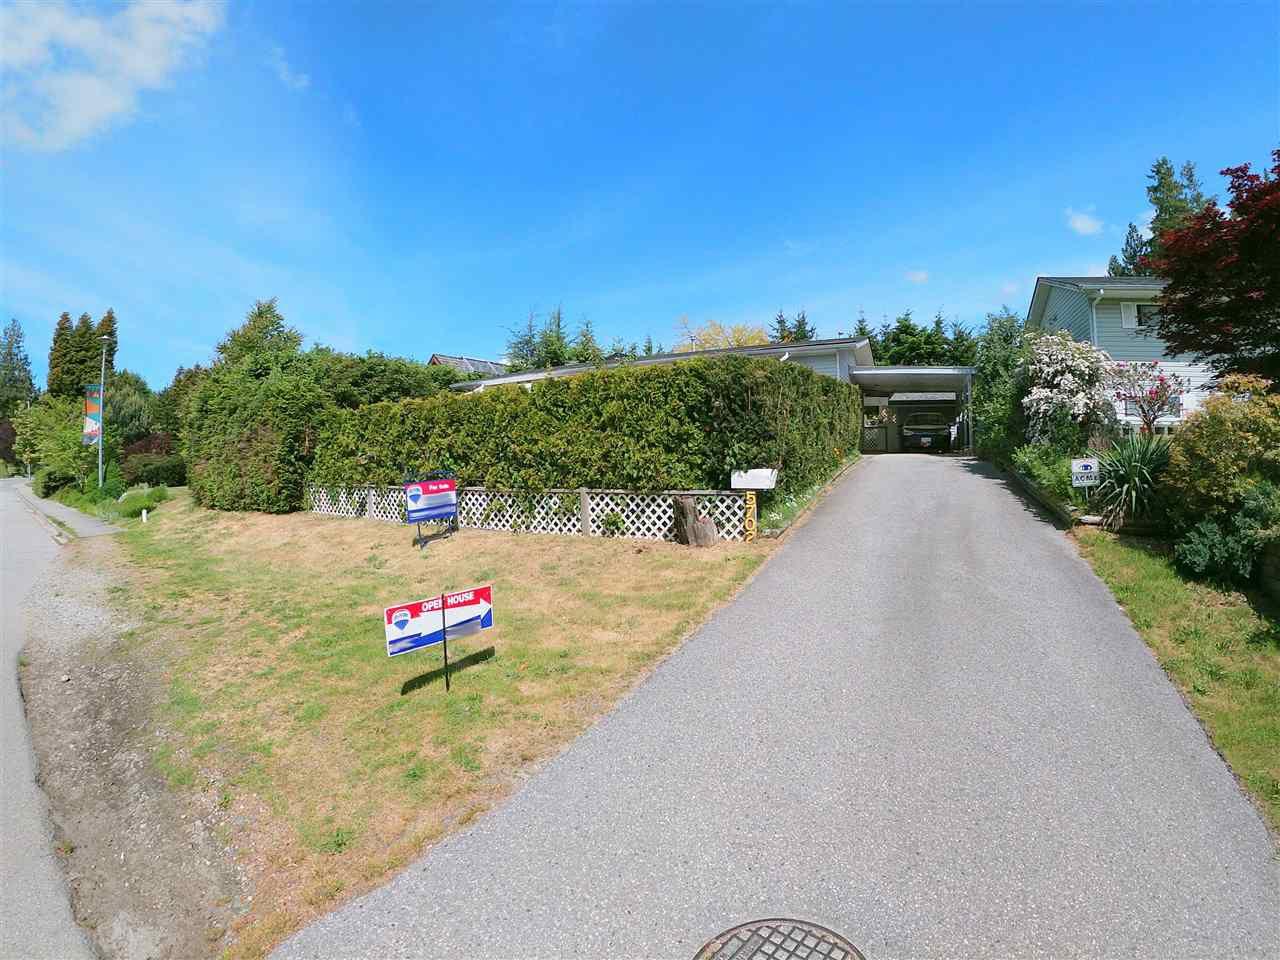 Photo 7: Photos: 5702 MEDUSA Street in Sechelt: Sechelt District House for sale (Sunshine Coast)  : MLS®# R2323721